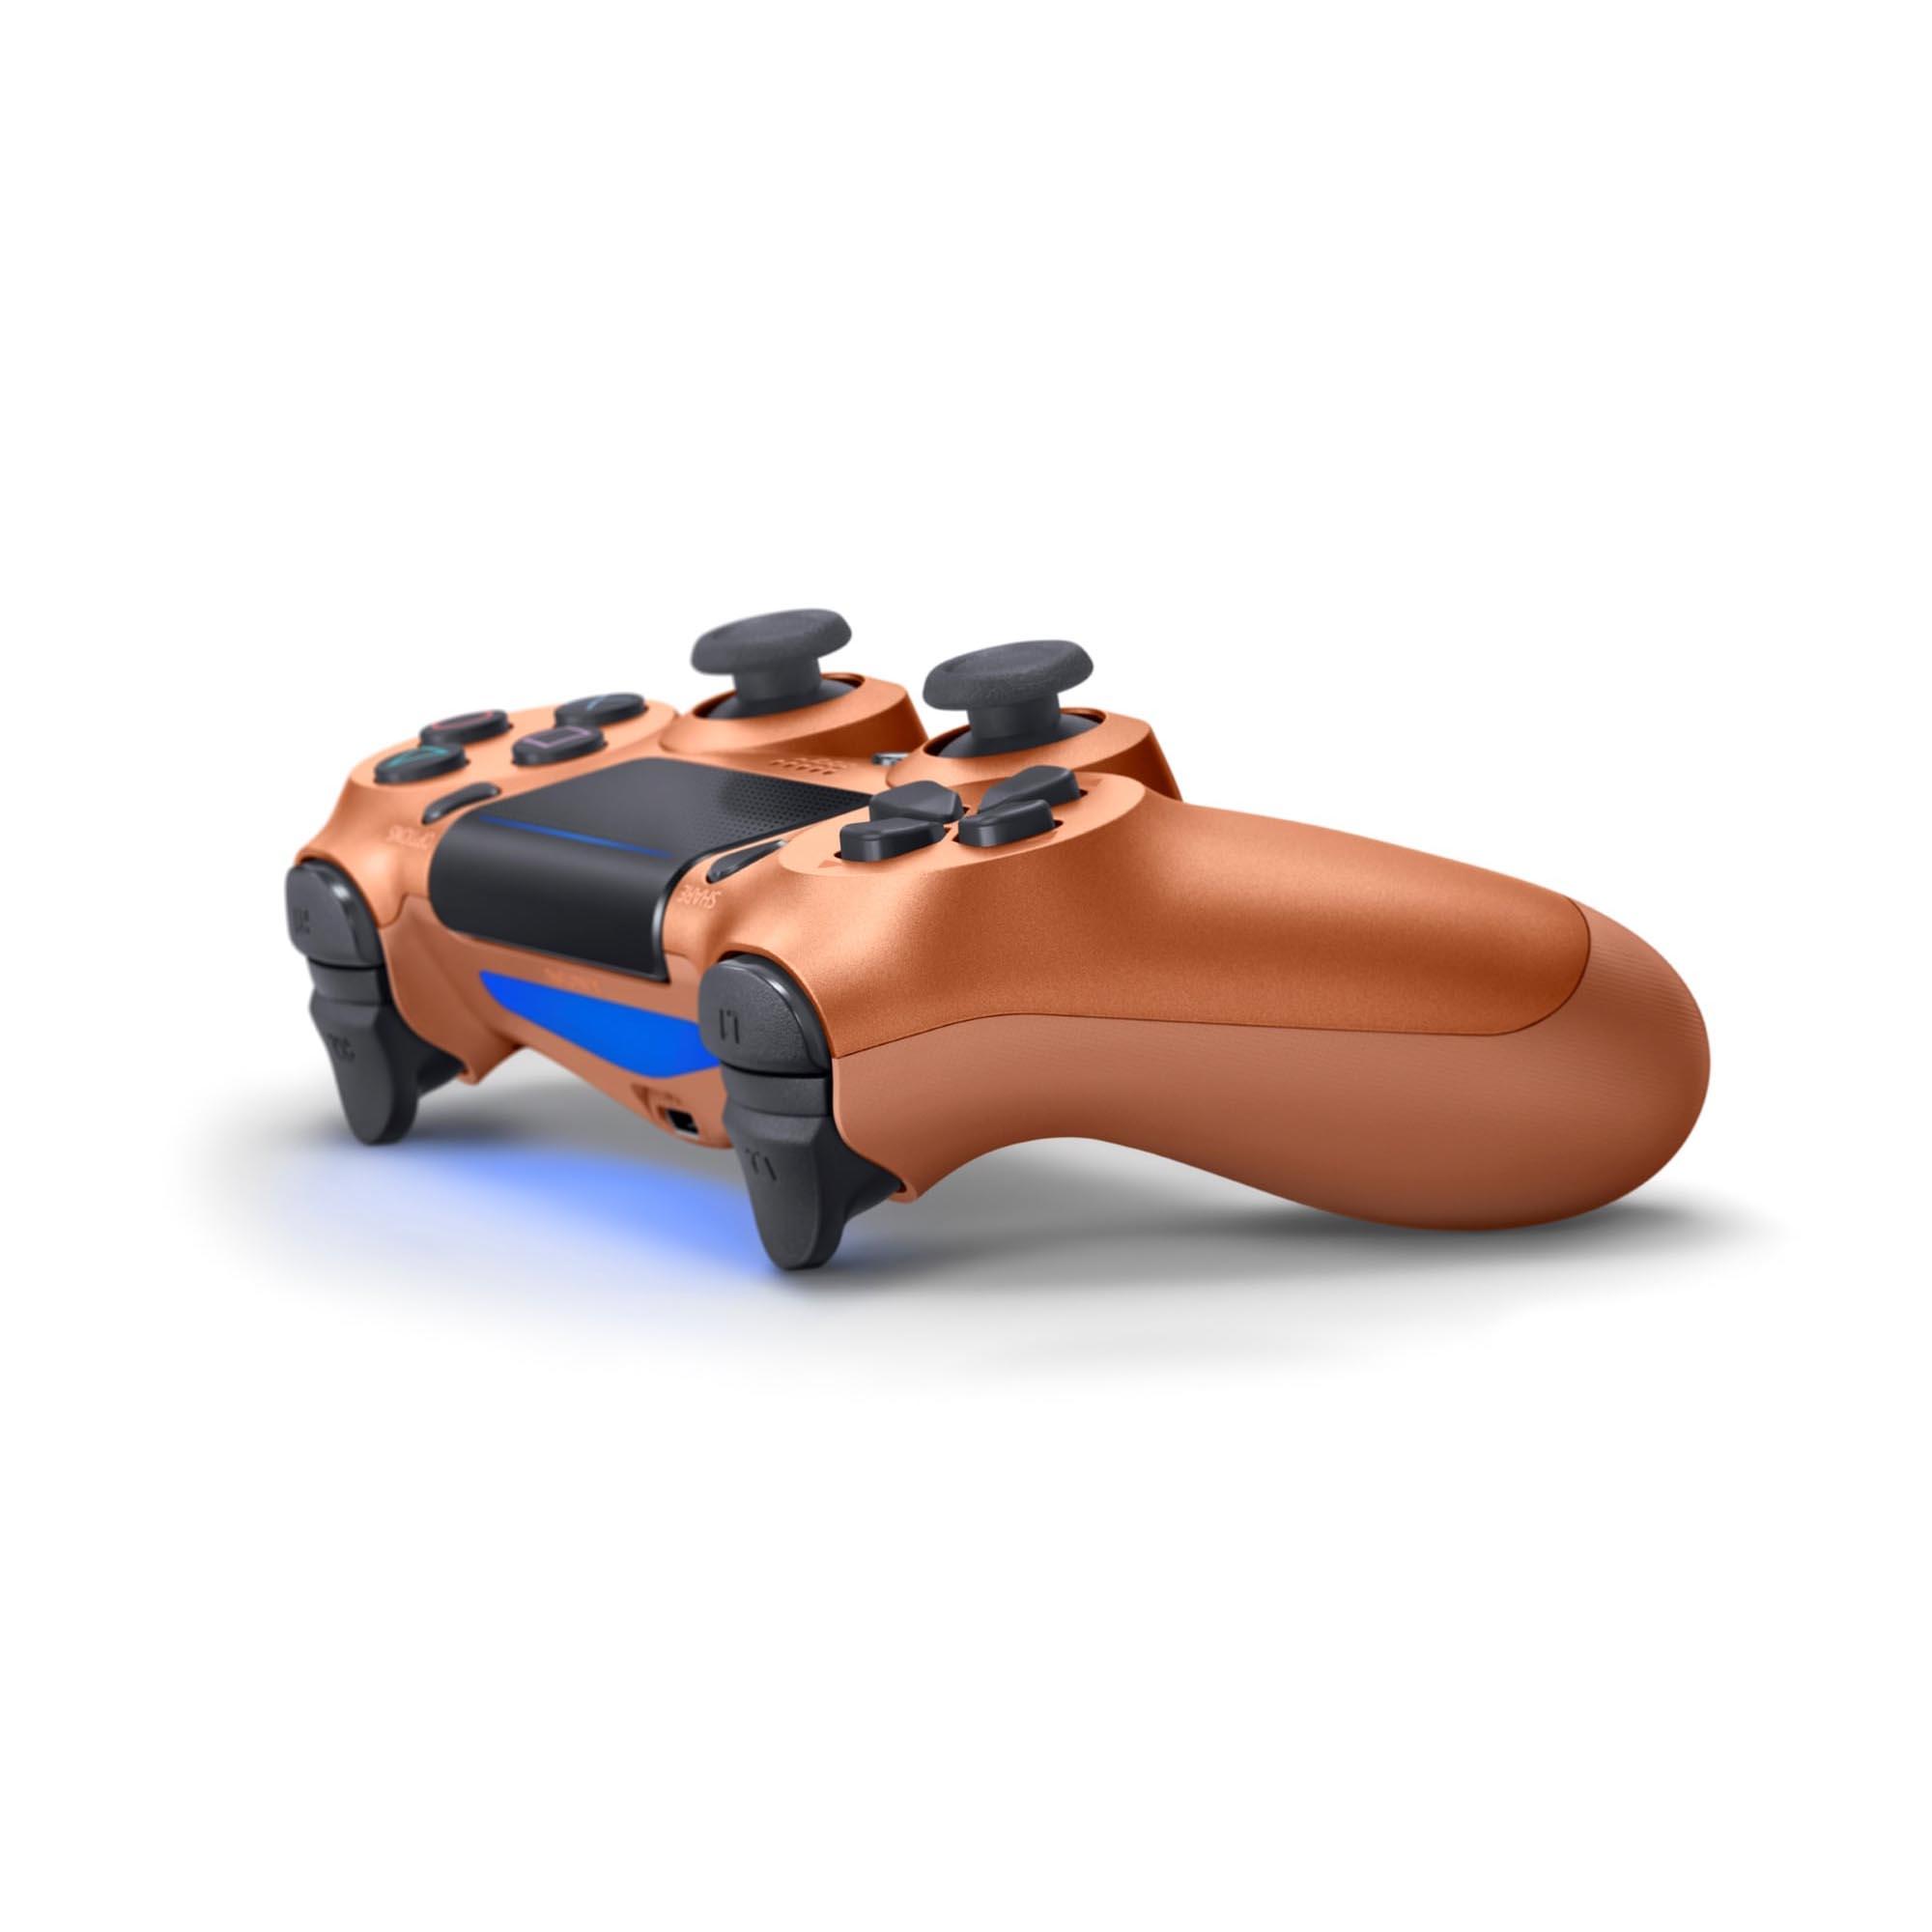 Controller Sony Dualshock 4 Copper v2 pentru PlayStation 4 2